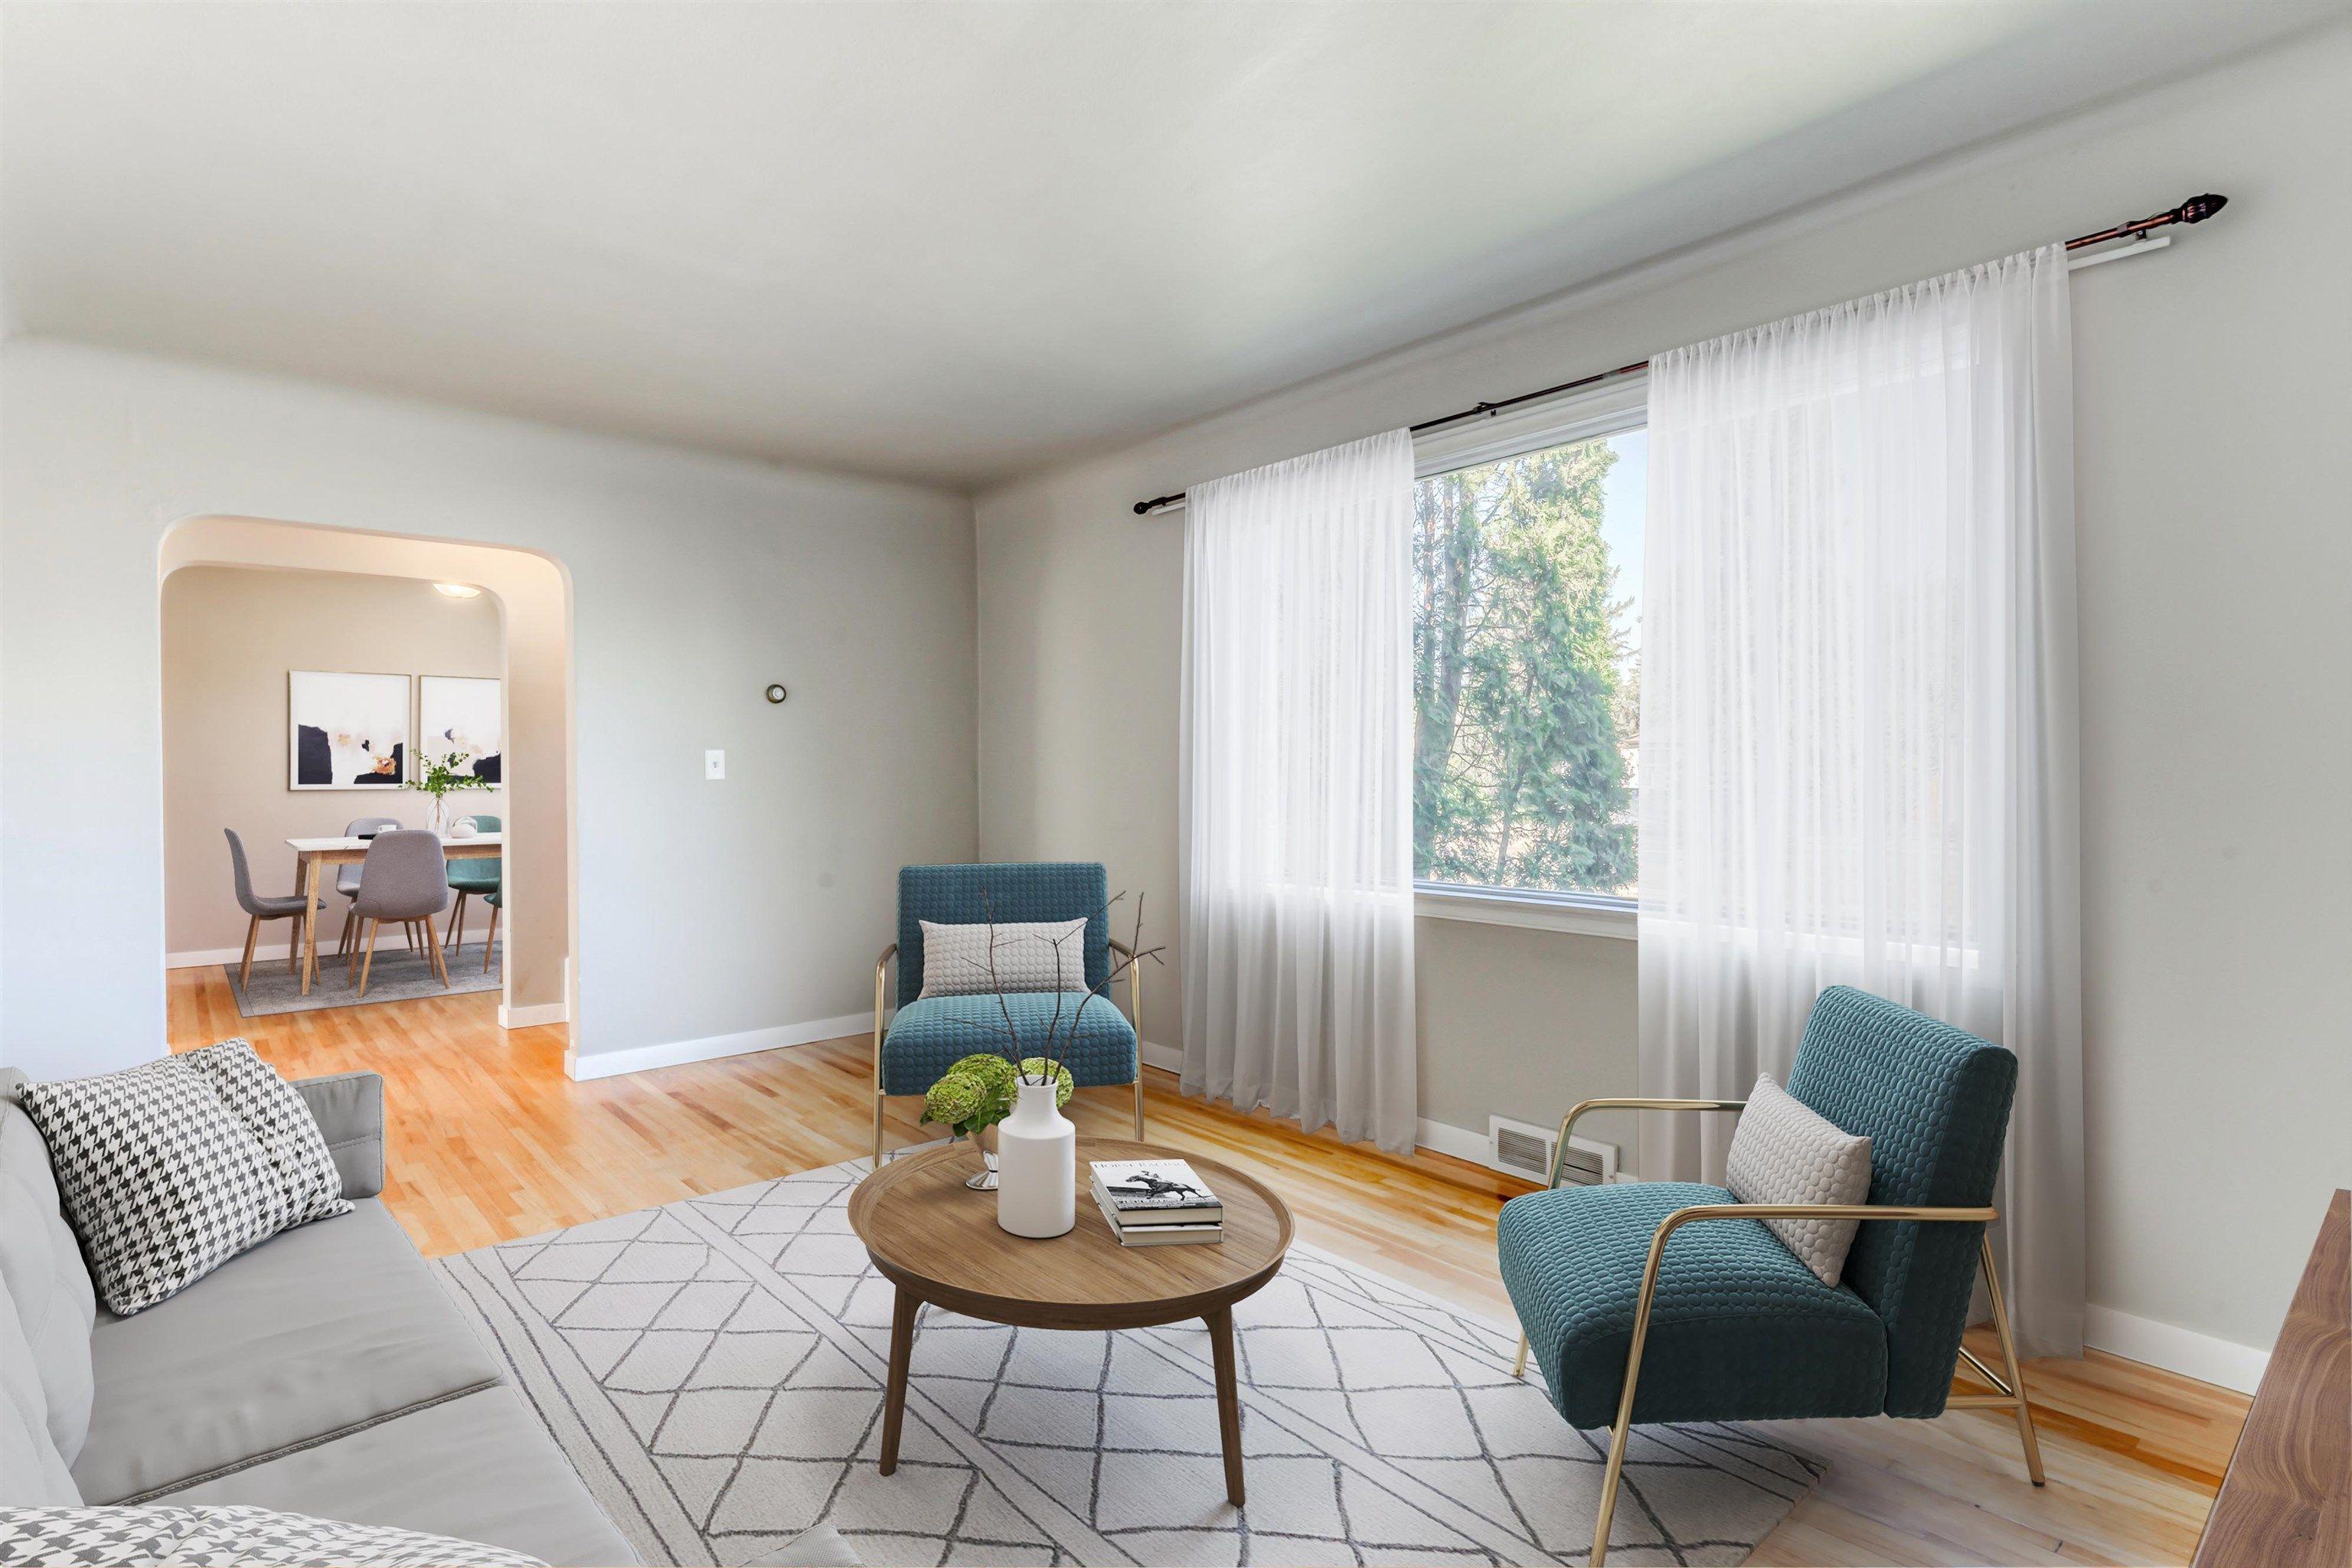 Main Photo: 10623 61 Avenue in Edmonton: Zone 15 House for sale : MLS®# E4264385